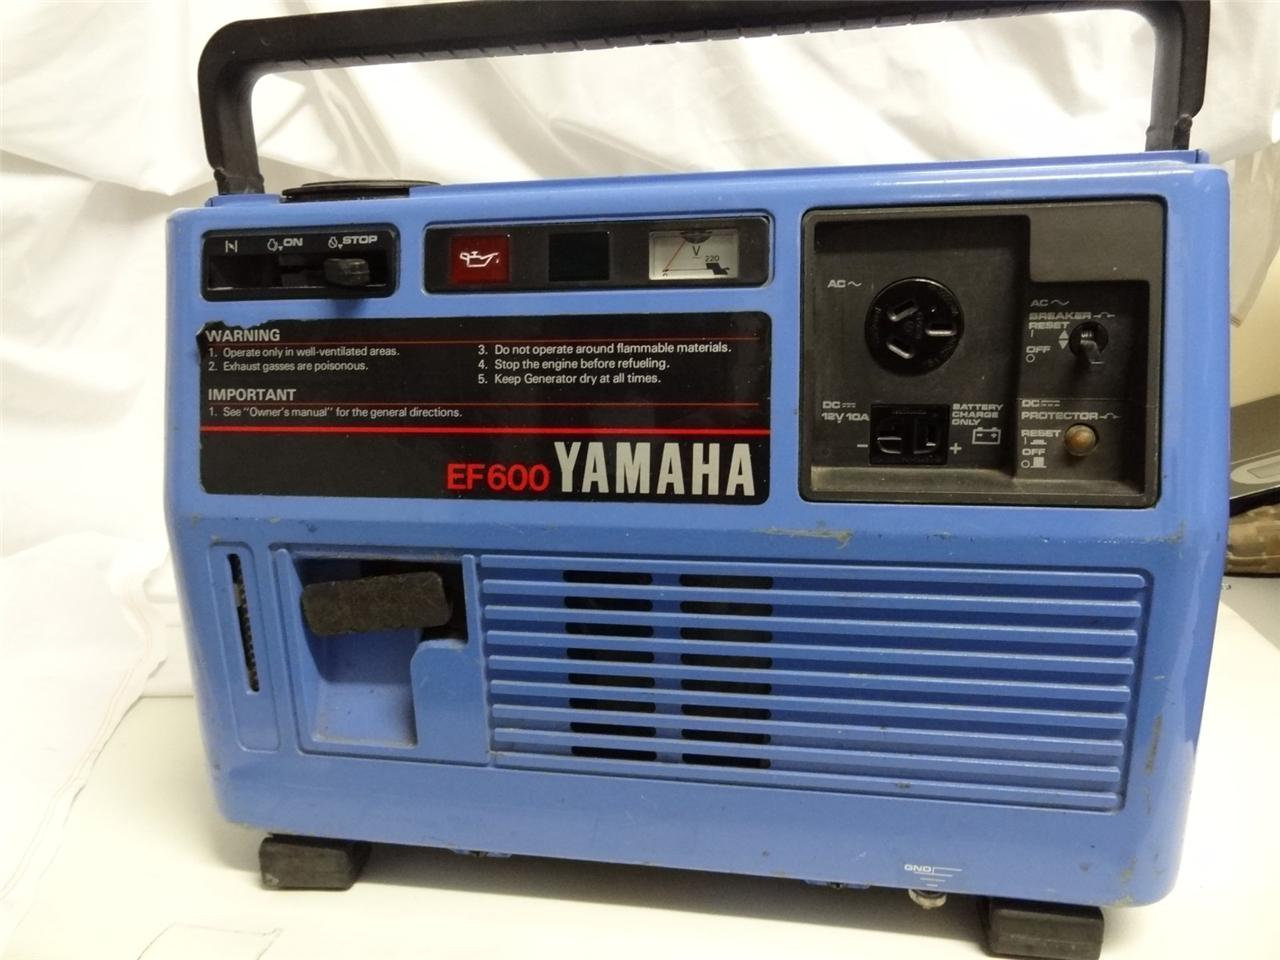 Yamaha ef600 portable generator ac dc 600 watts 4 stroke for Ef600 yamaha generator